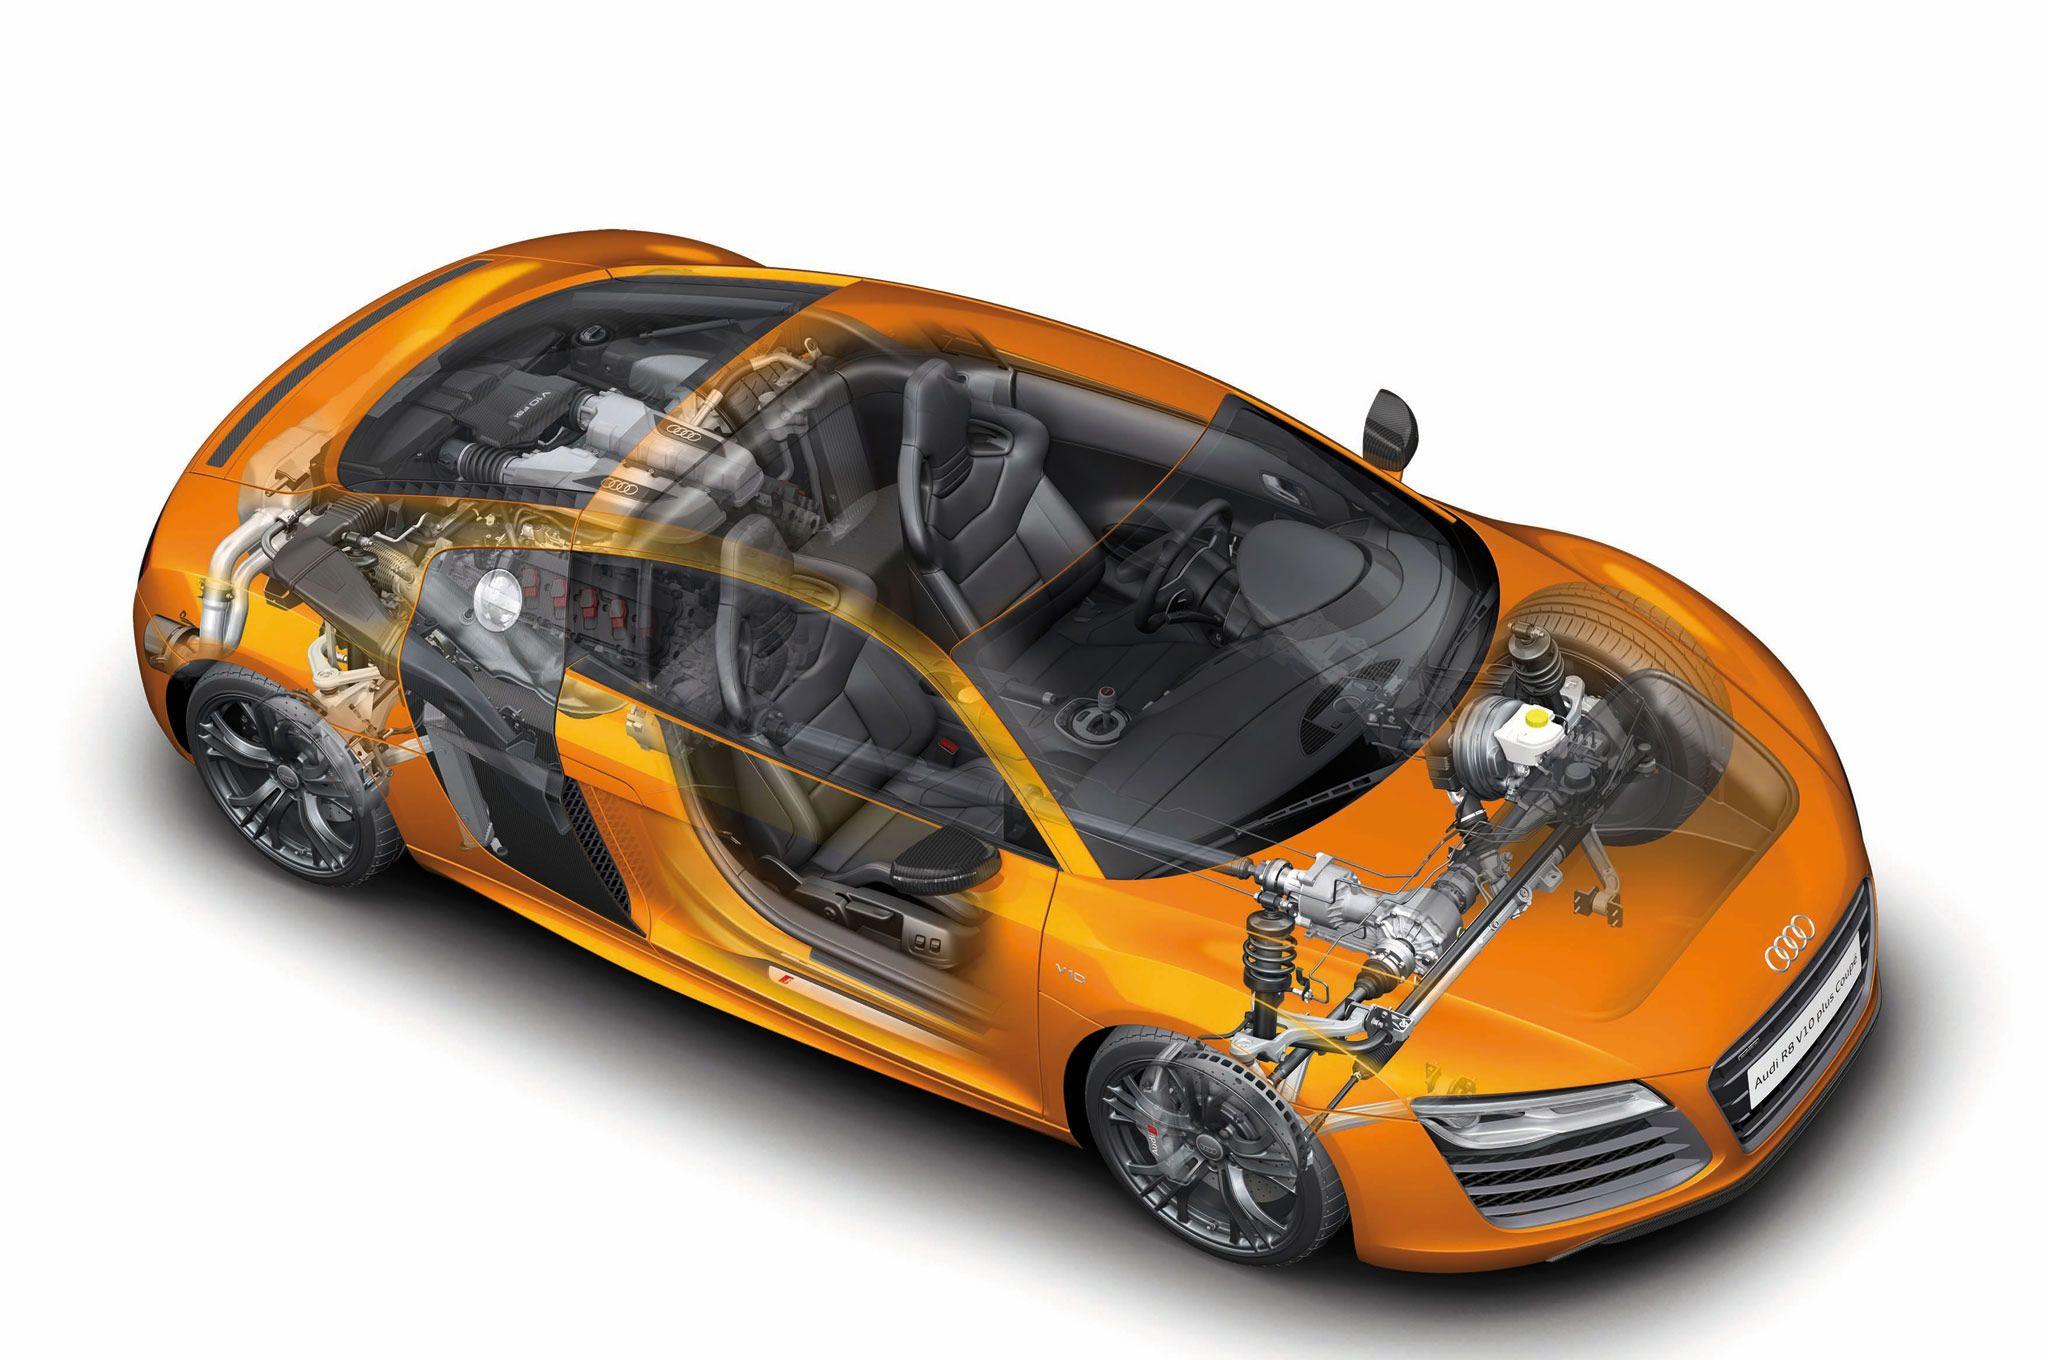 Audi R8 Cutaway Audi R8 V10 Audi Audi R8 V10 Plus